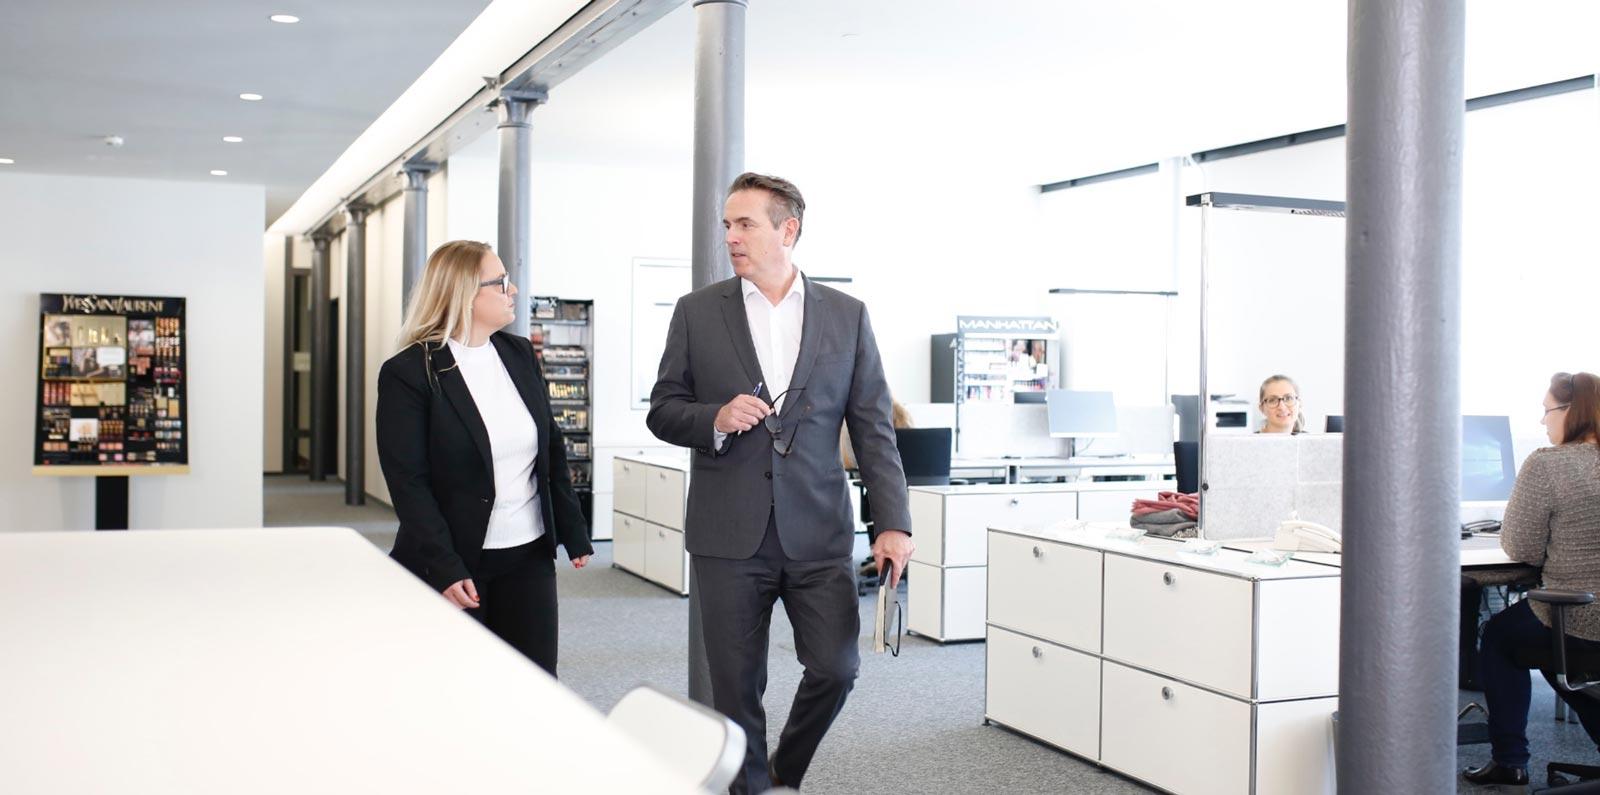 SIG Sales GmbH & Co. KG Locations